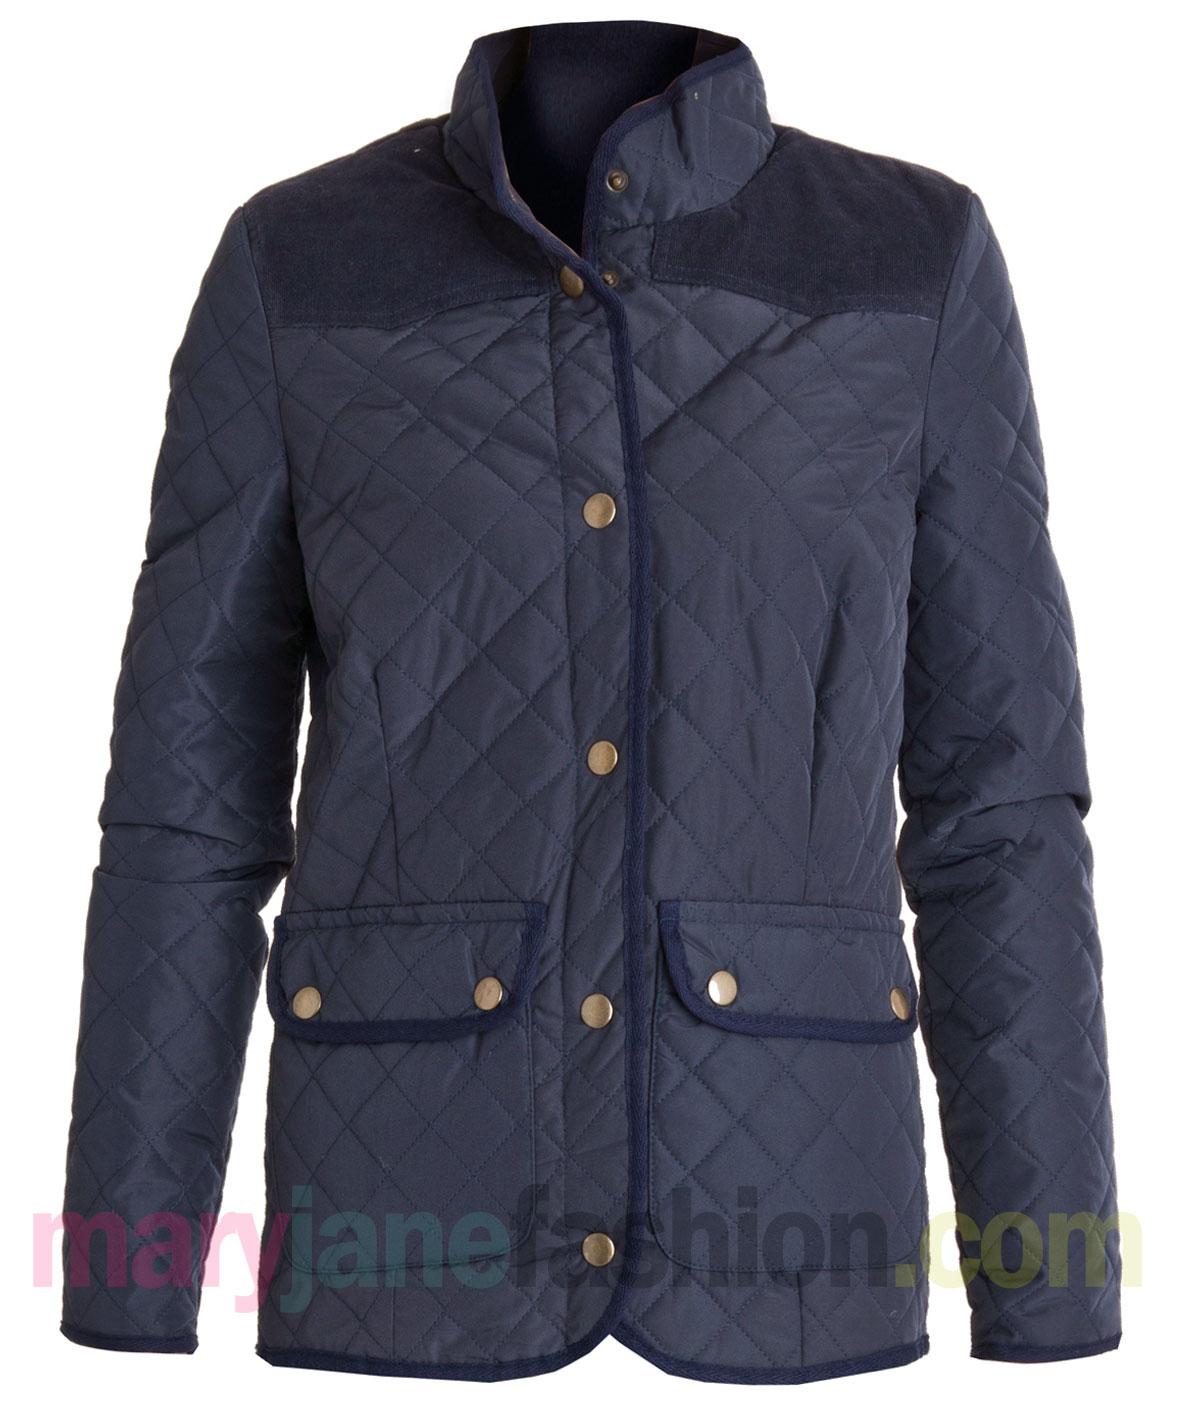 Womens corduroy coat